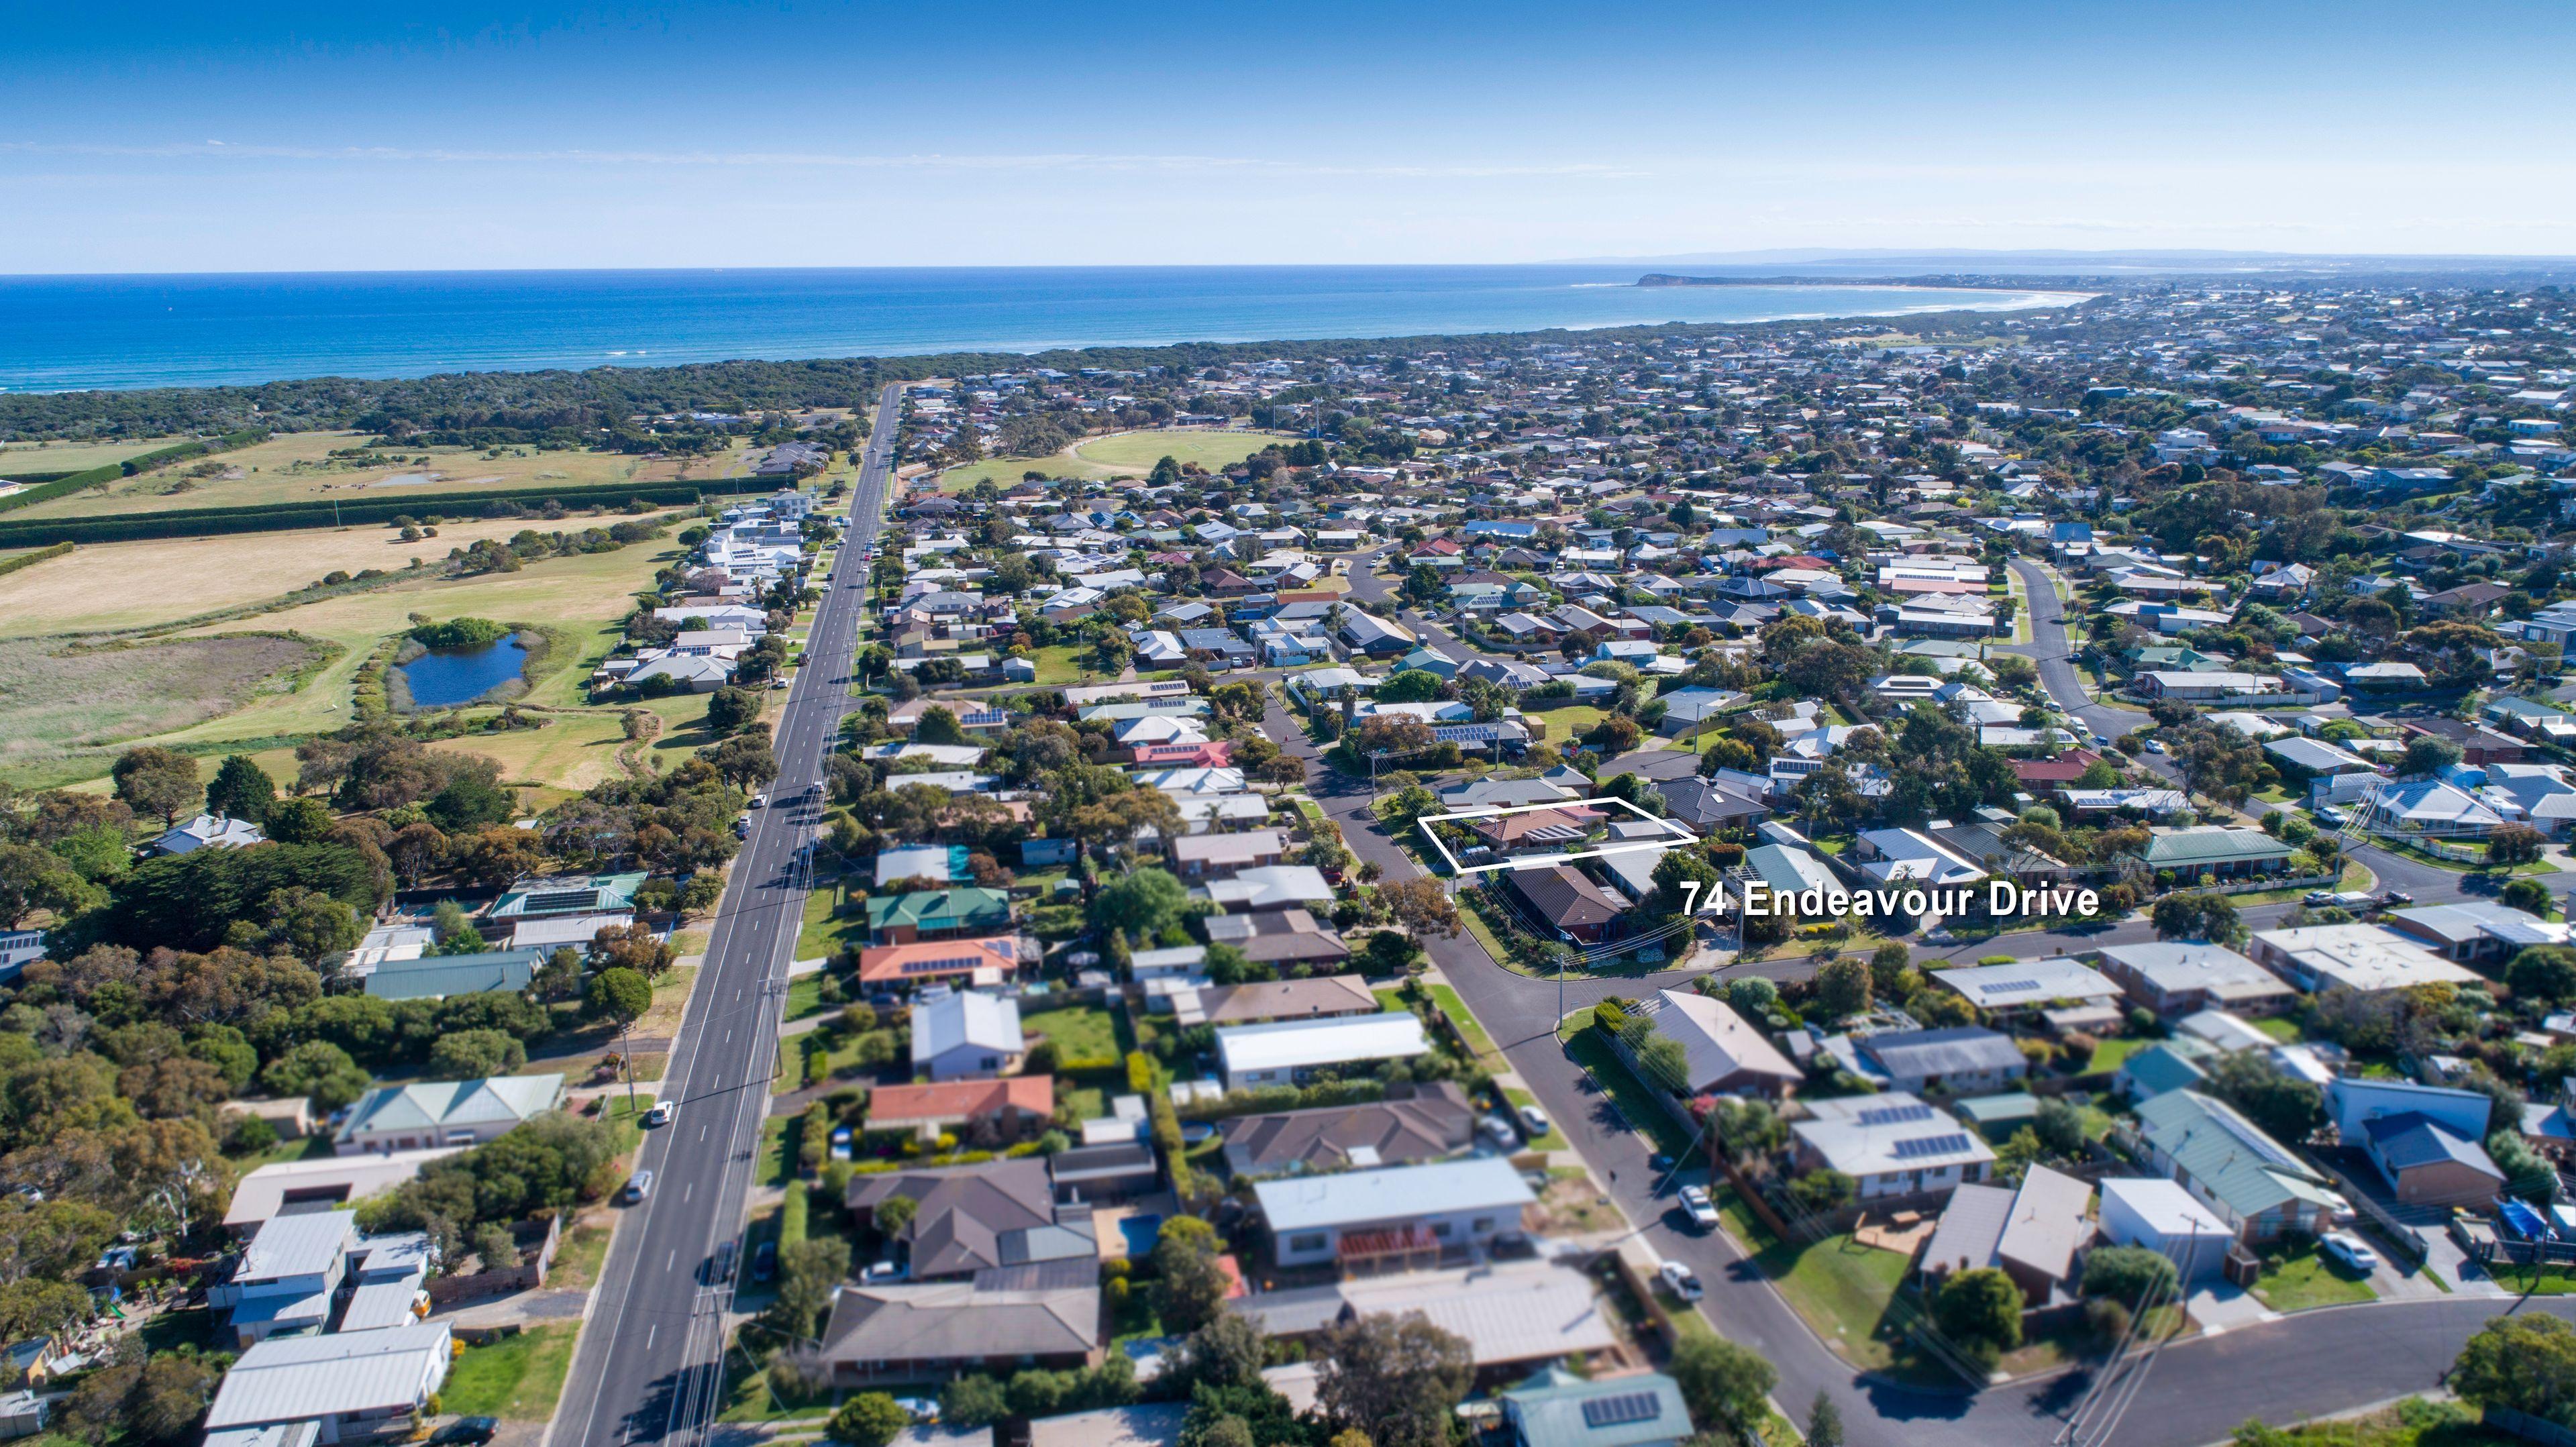 74 Endeavour Drive, Ocean Grove Victoria 3226